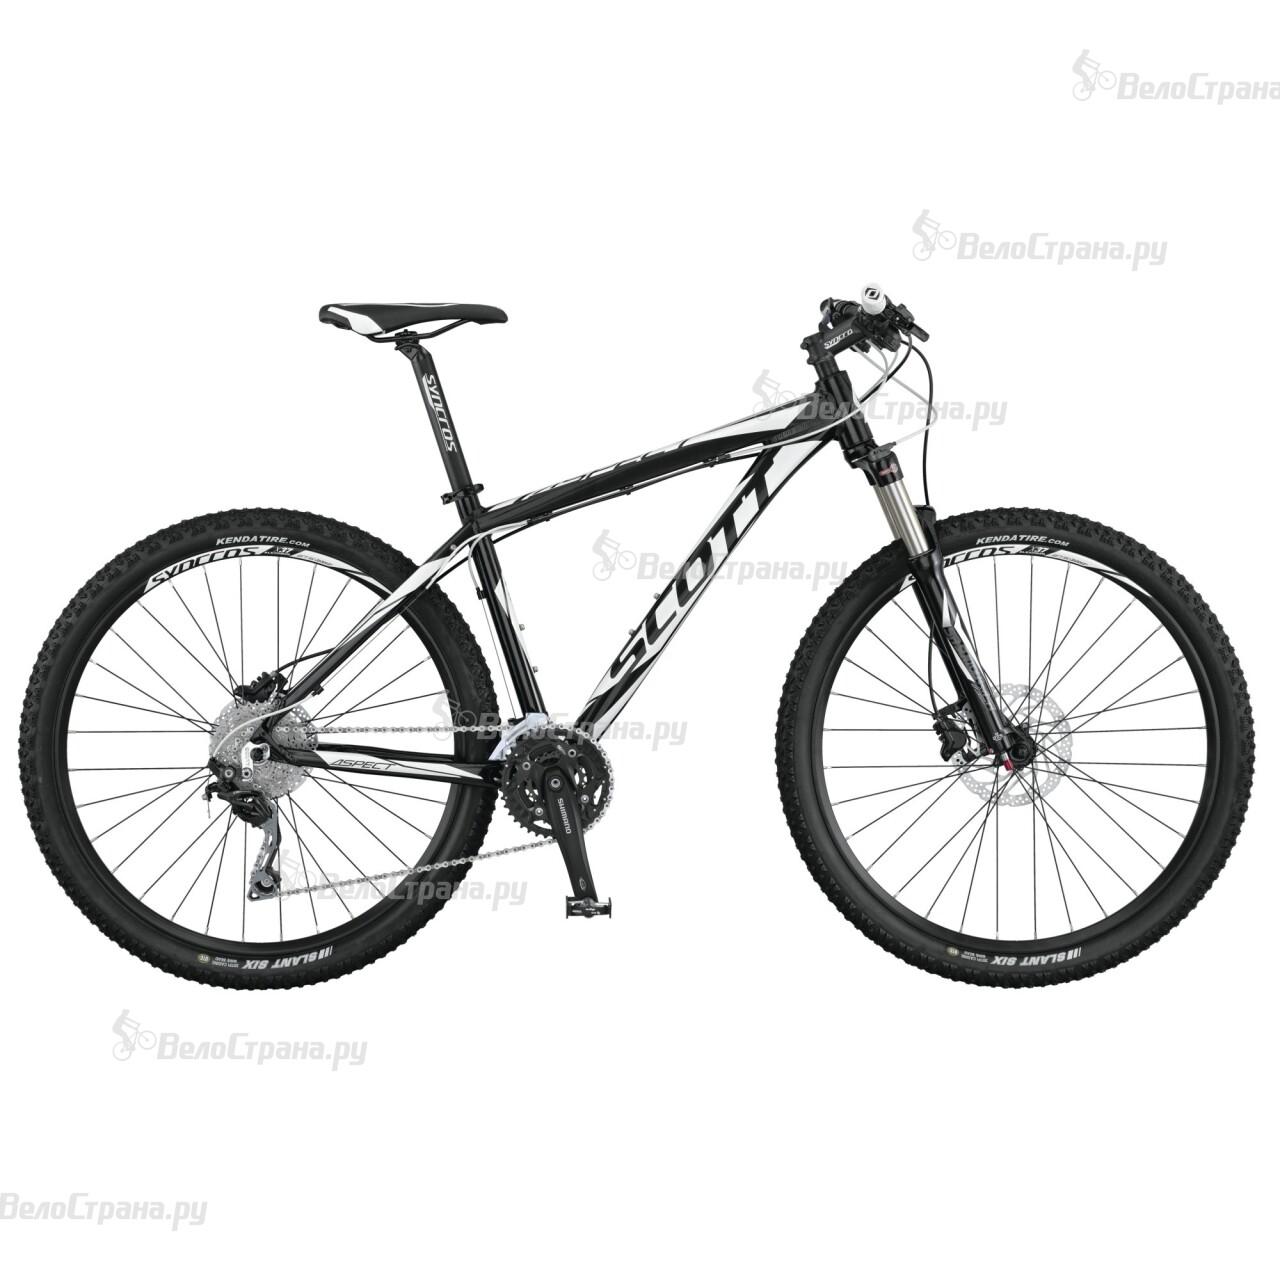 Велосипед Scott Aspect 720 (2015)